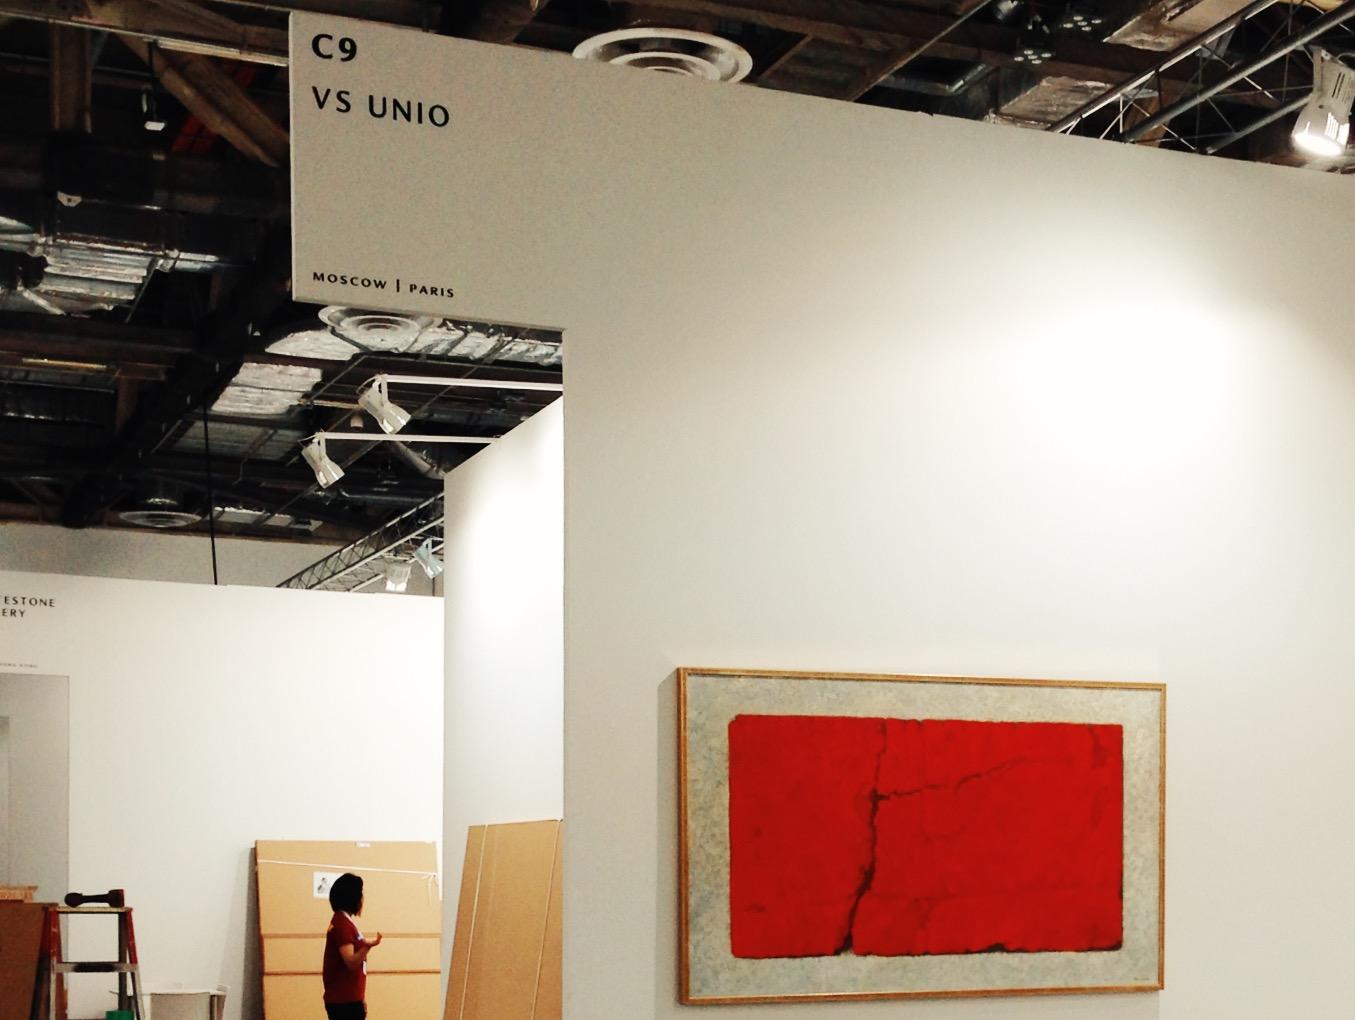 Галерея VS Unio на выставке Art Stage Singapore 2016   галерея [1] фото [5]